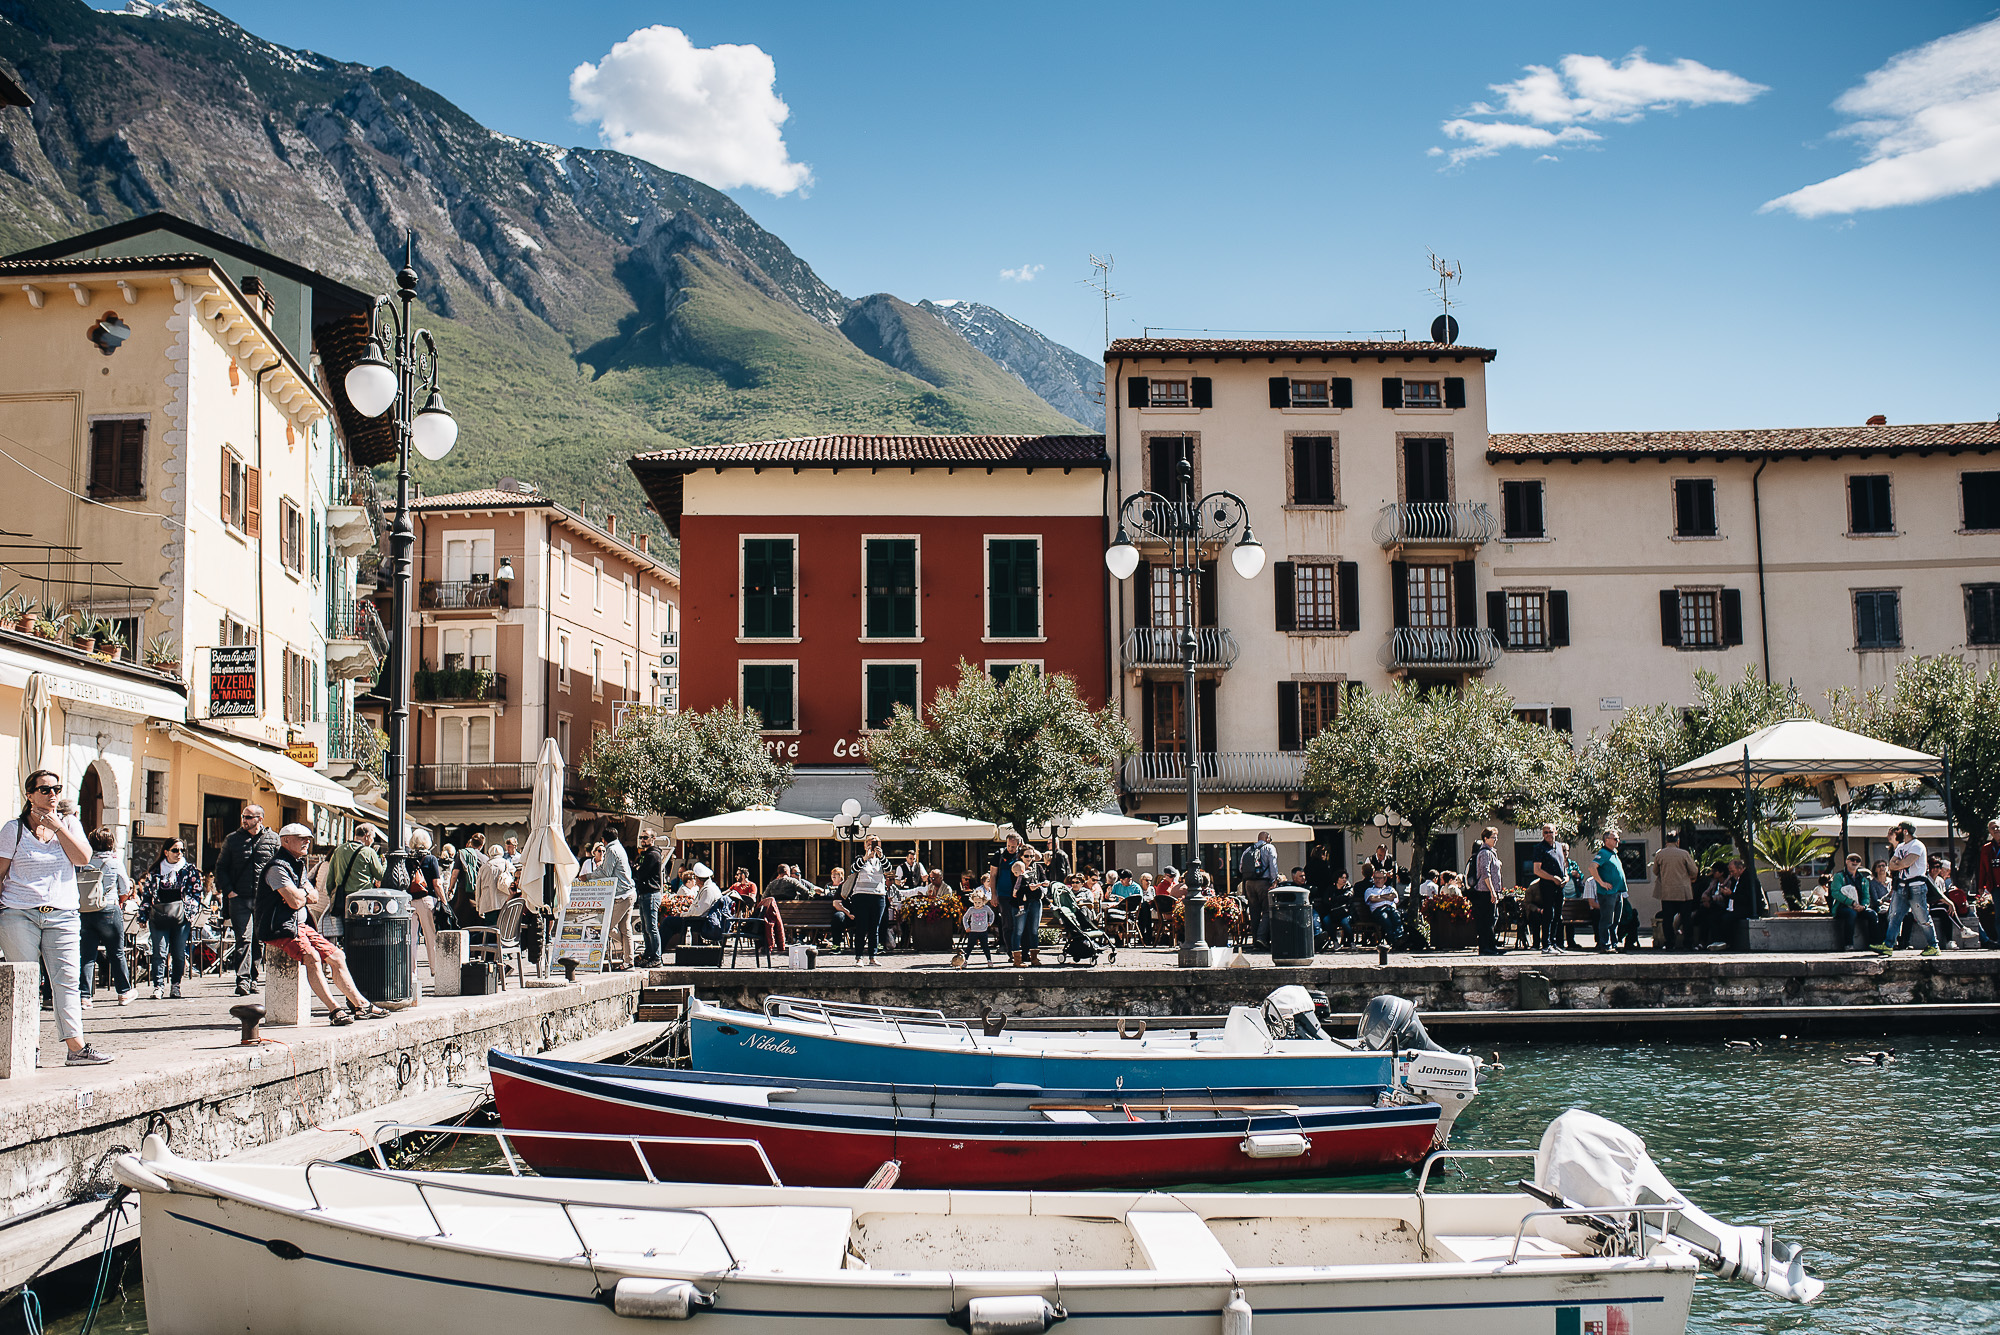 OurBeautifulAdventure-LakeGarda-Italy-Blog-1232.jpg